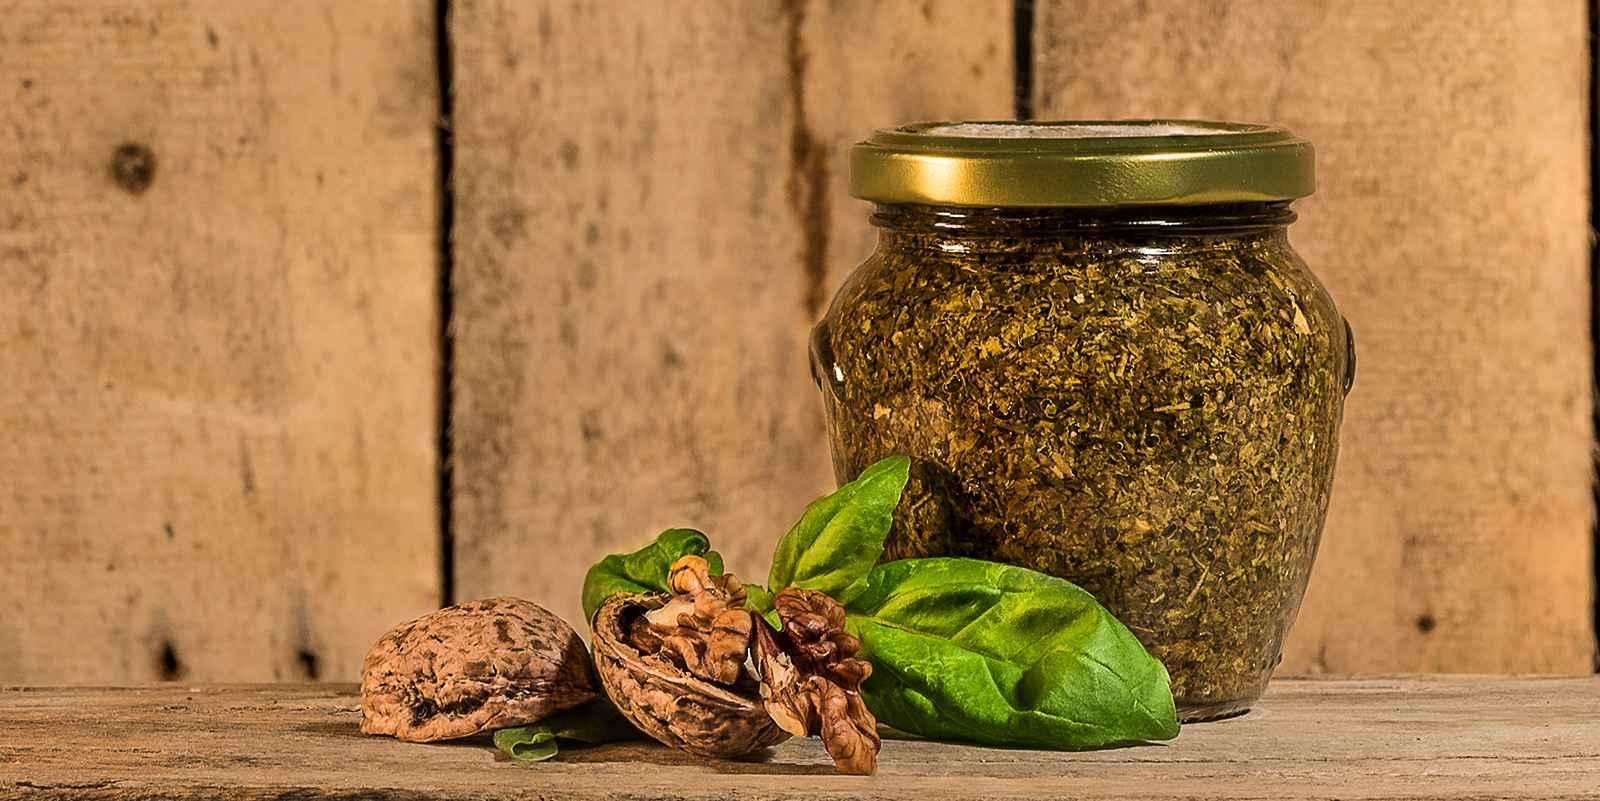 Pesto Basilico e Noci